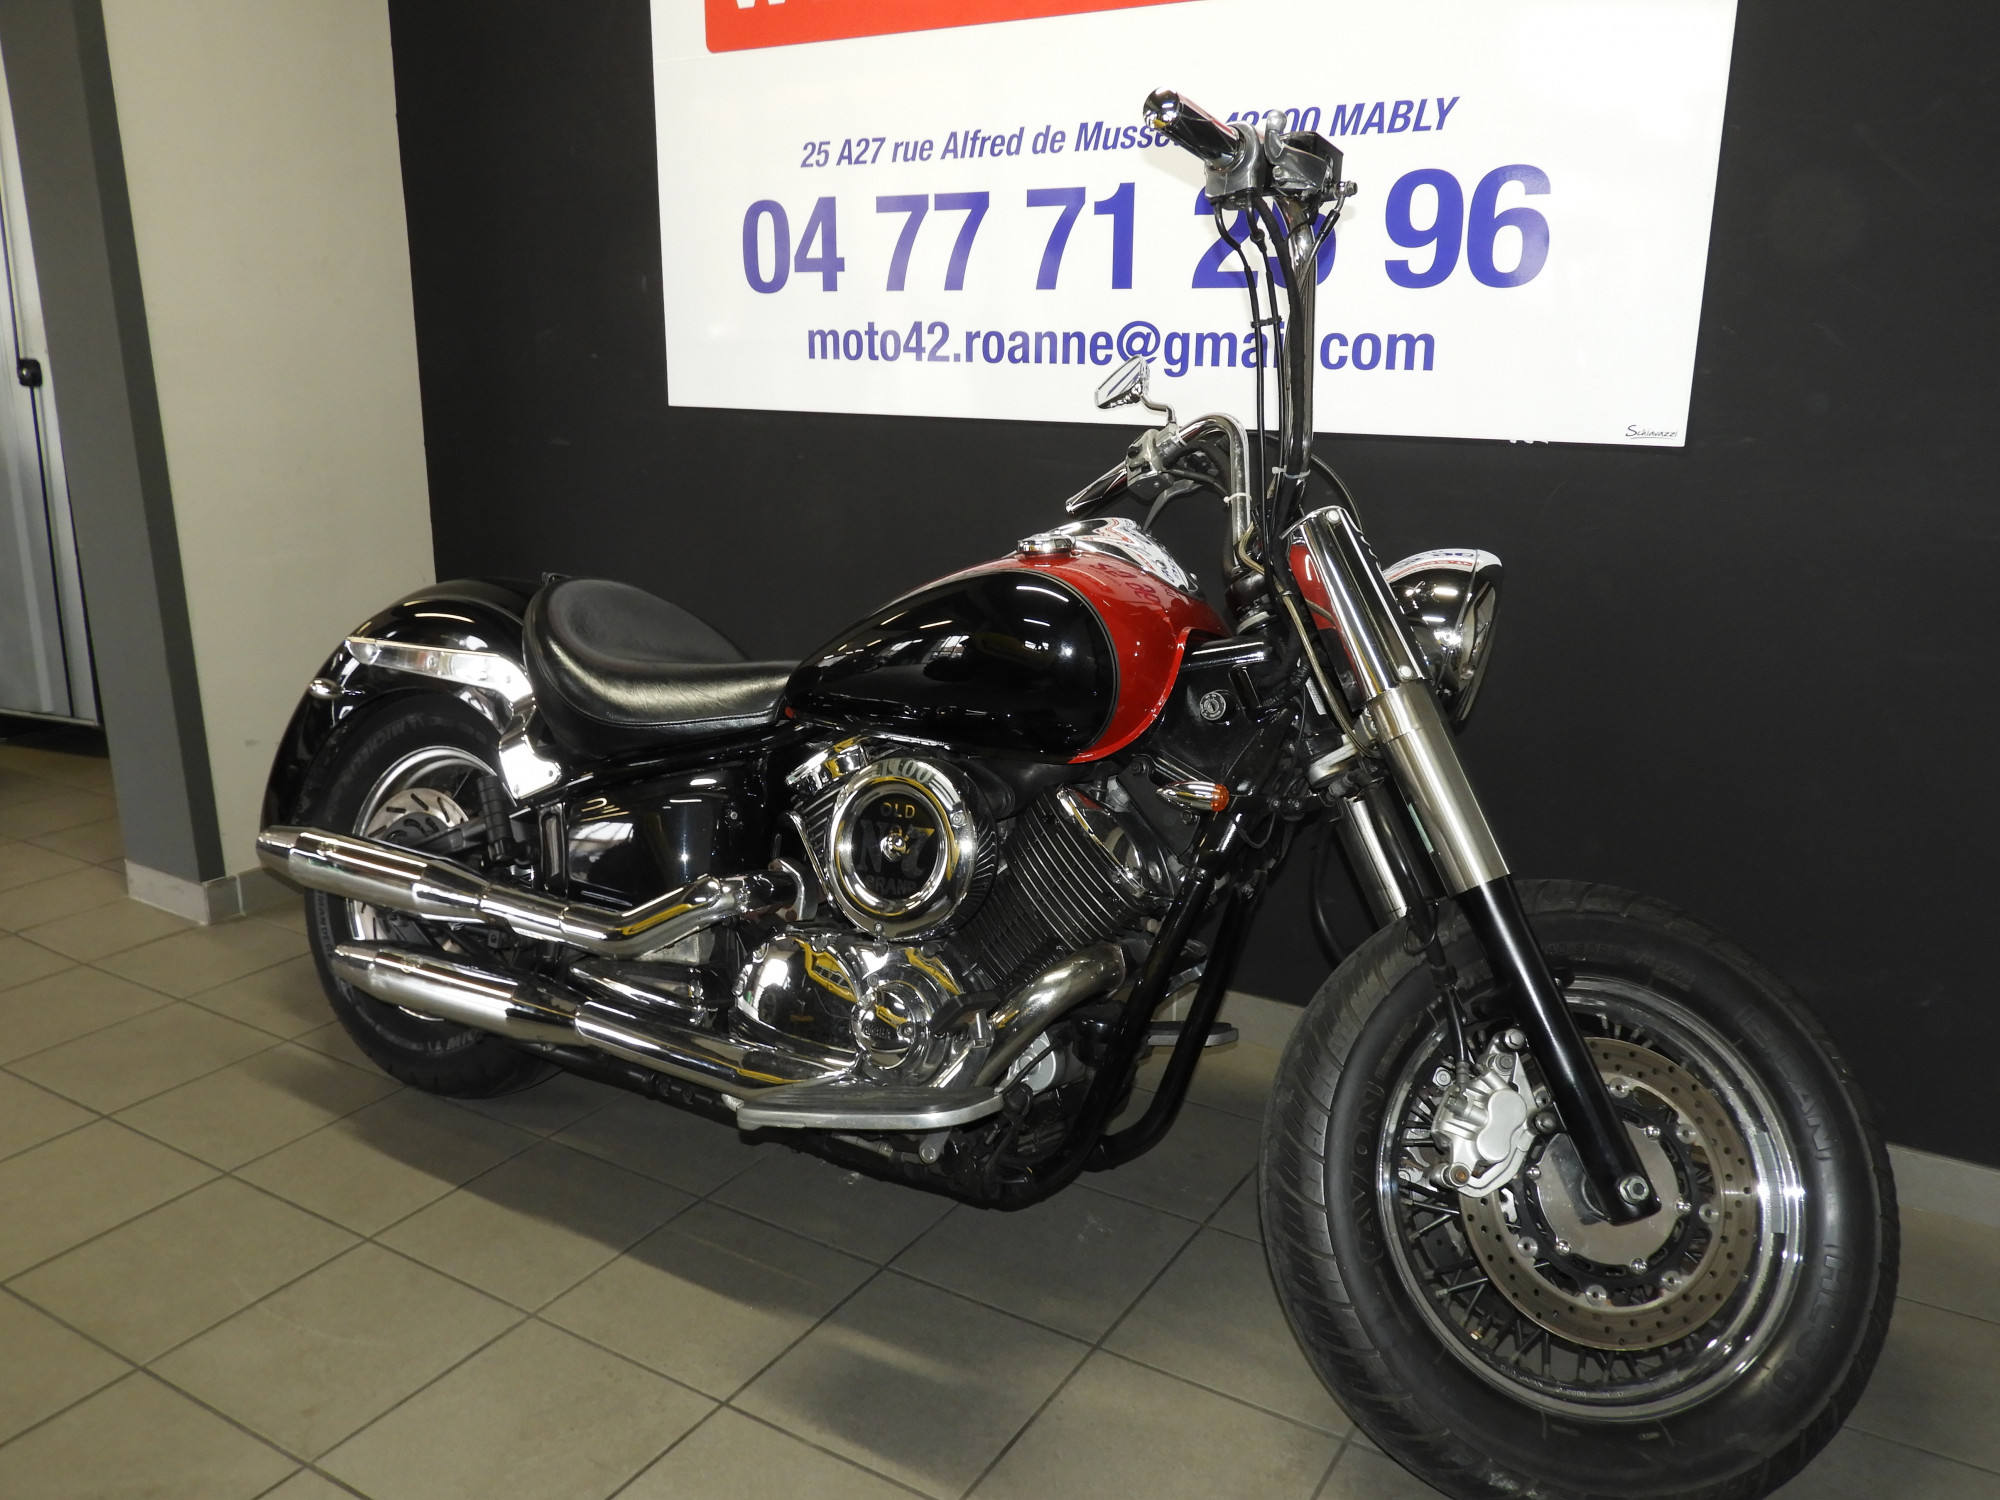 Cherche pieces moto occasion yamaha 1100 dragstar